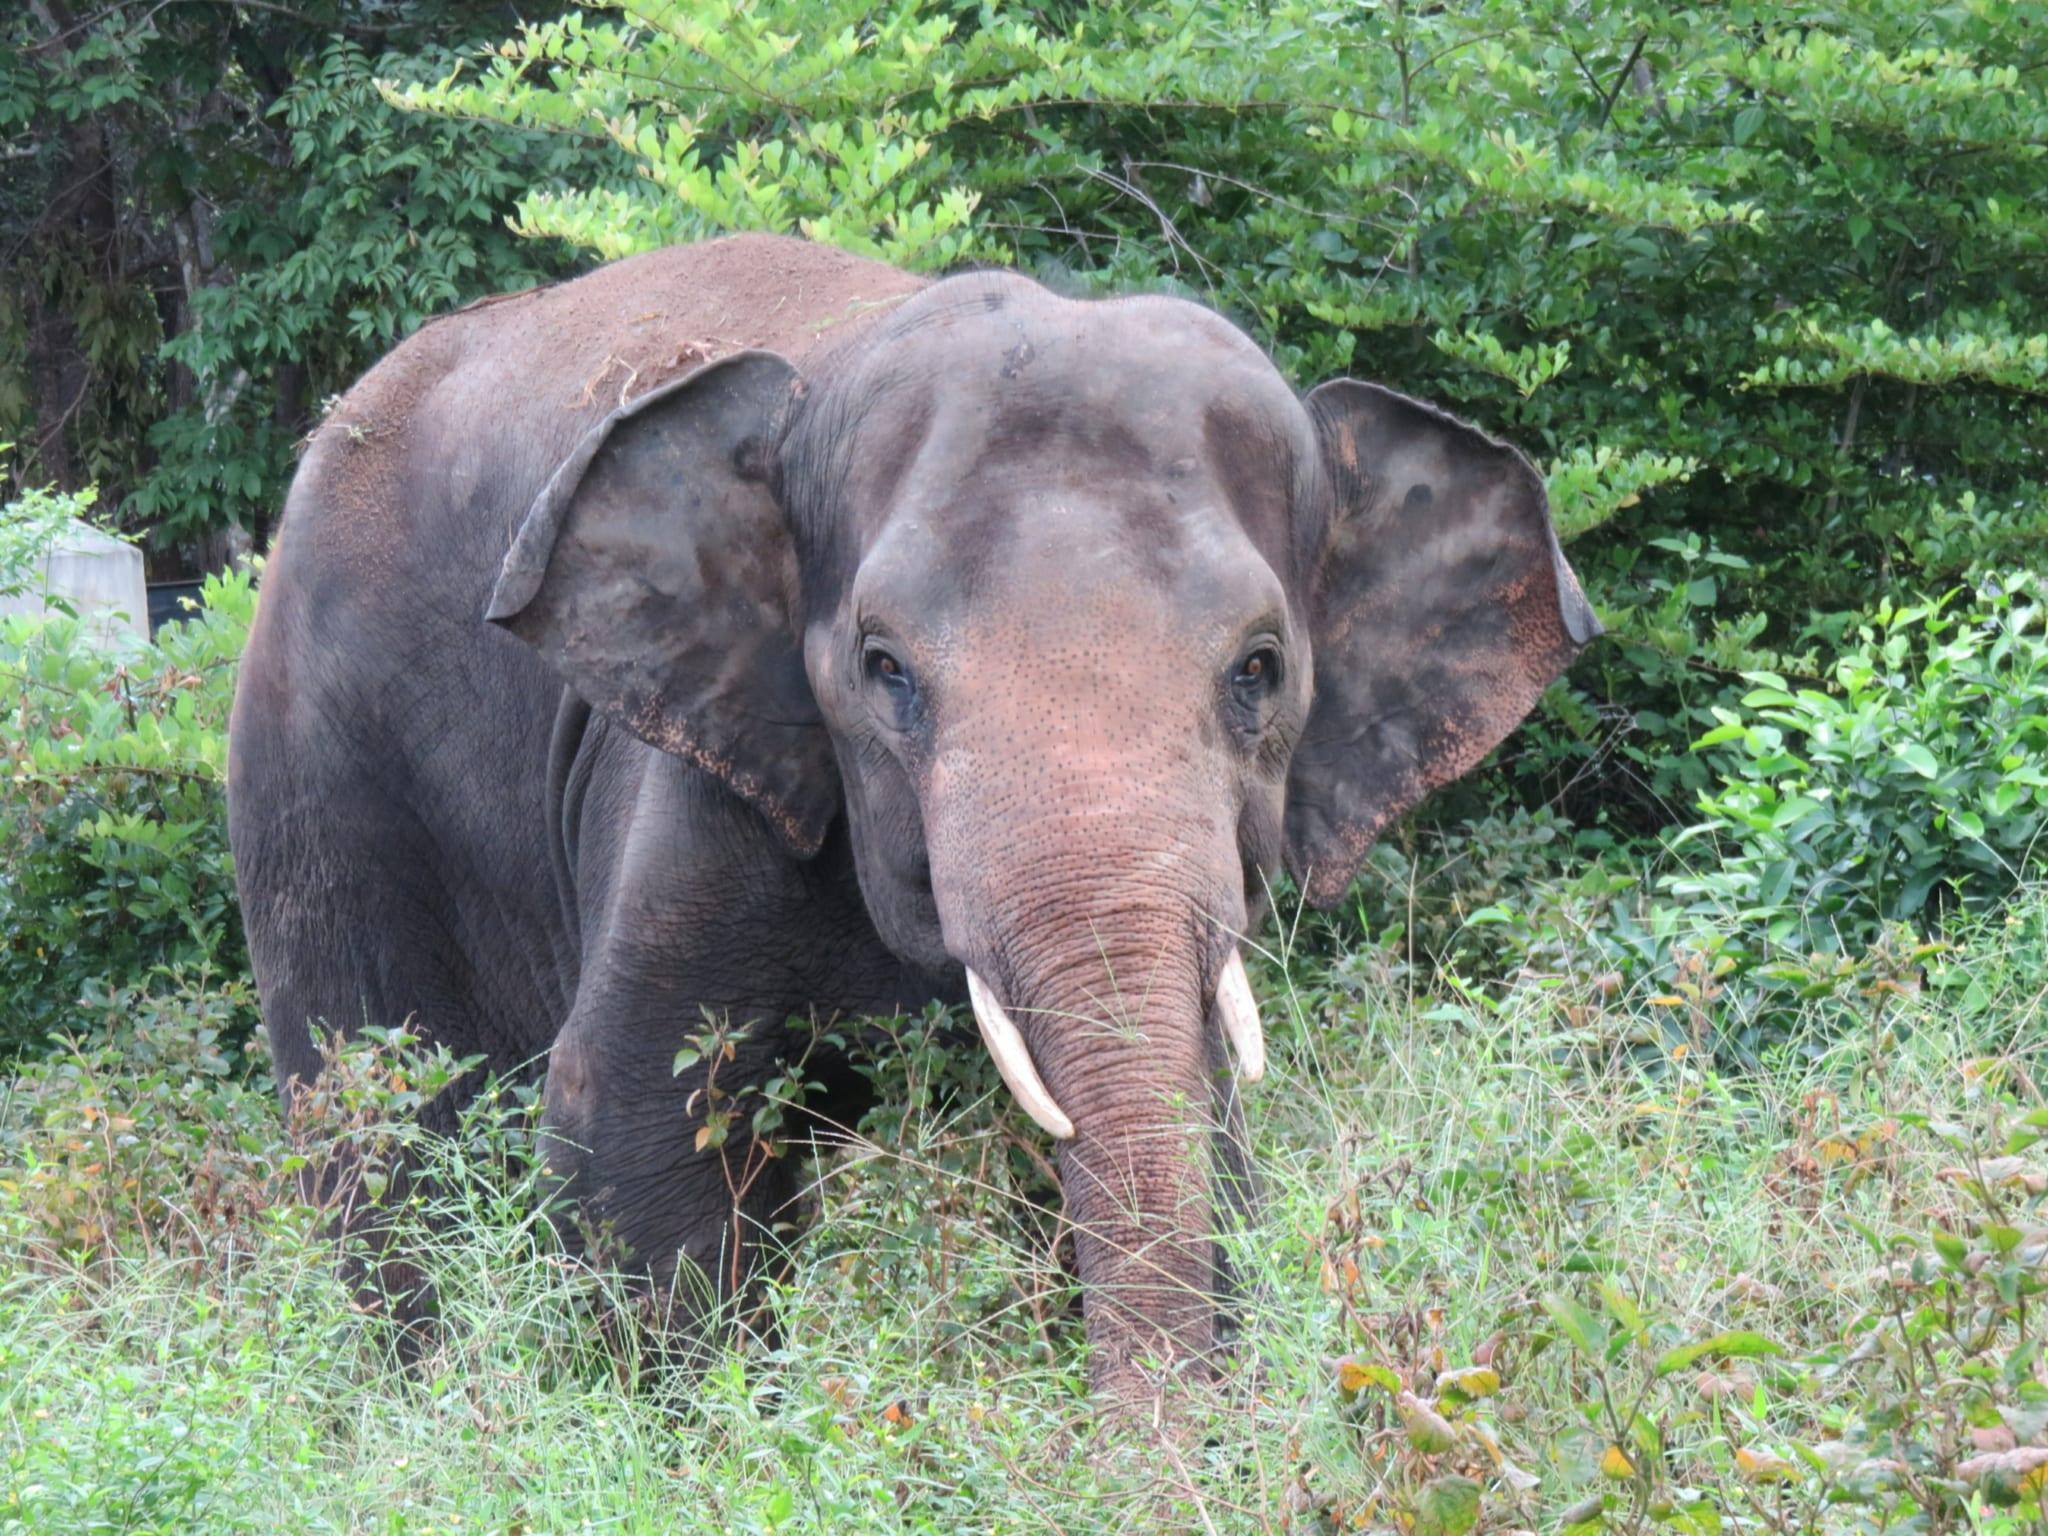 Chhouk the elephant gets a new prosthetic